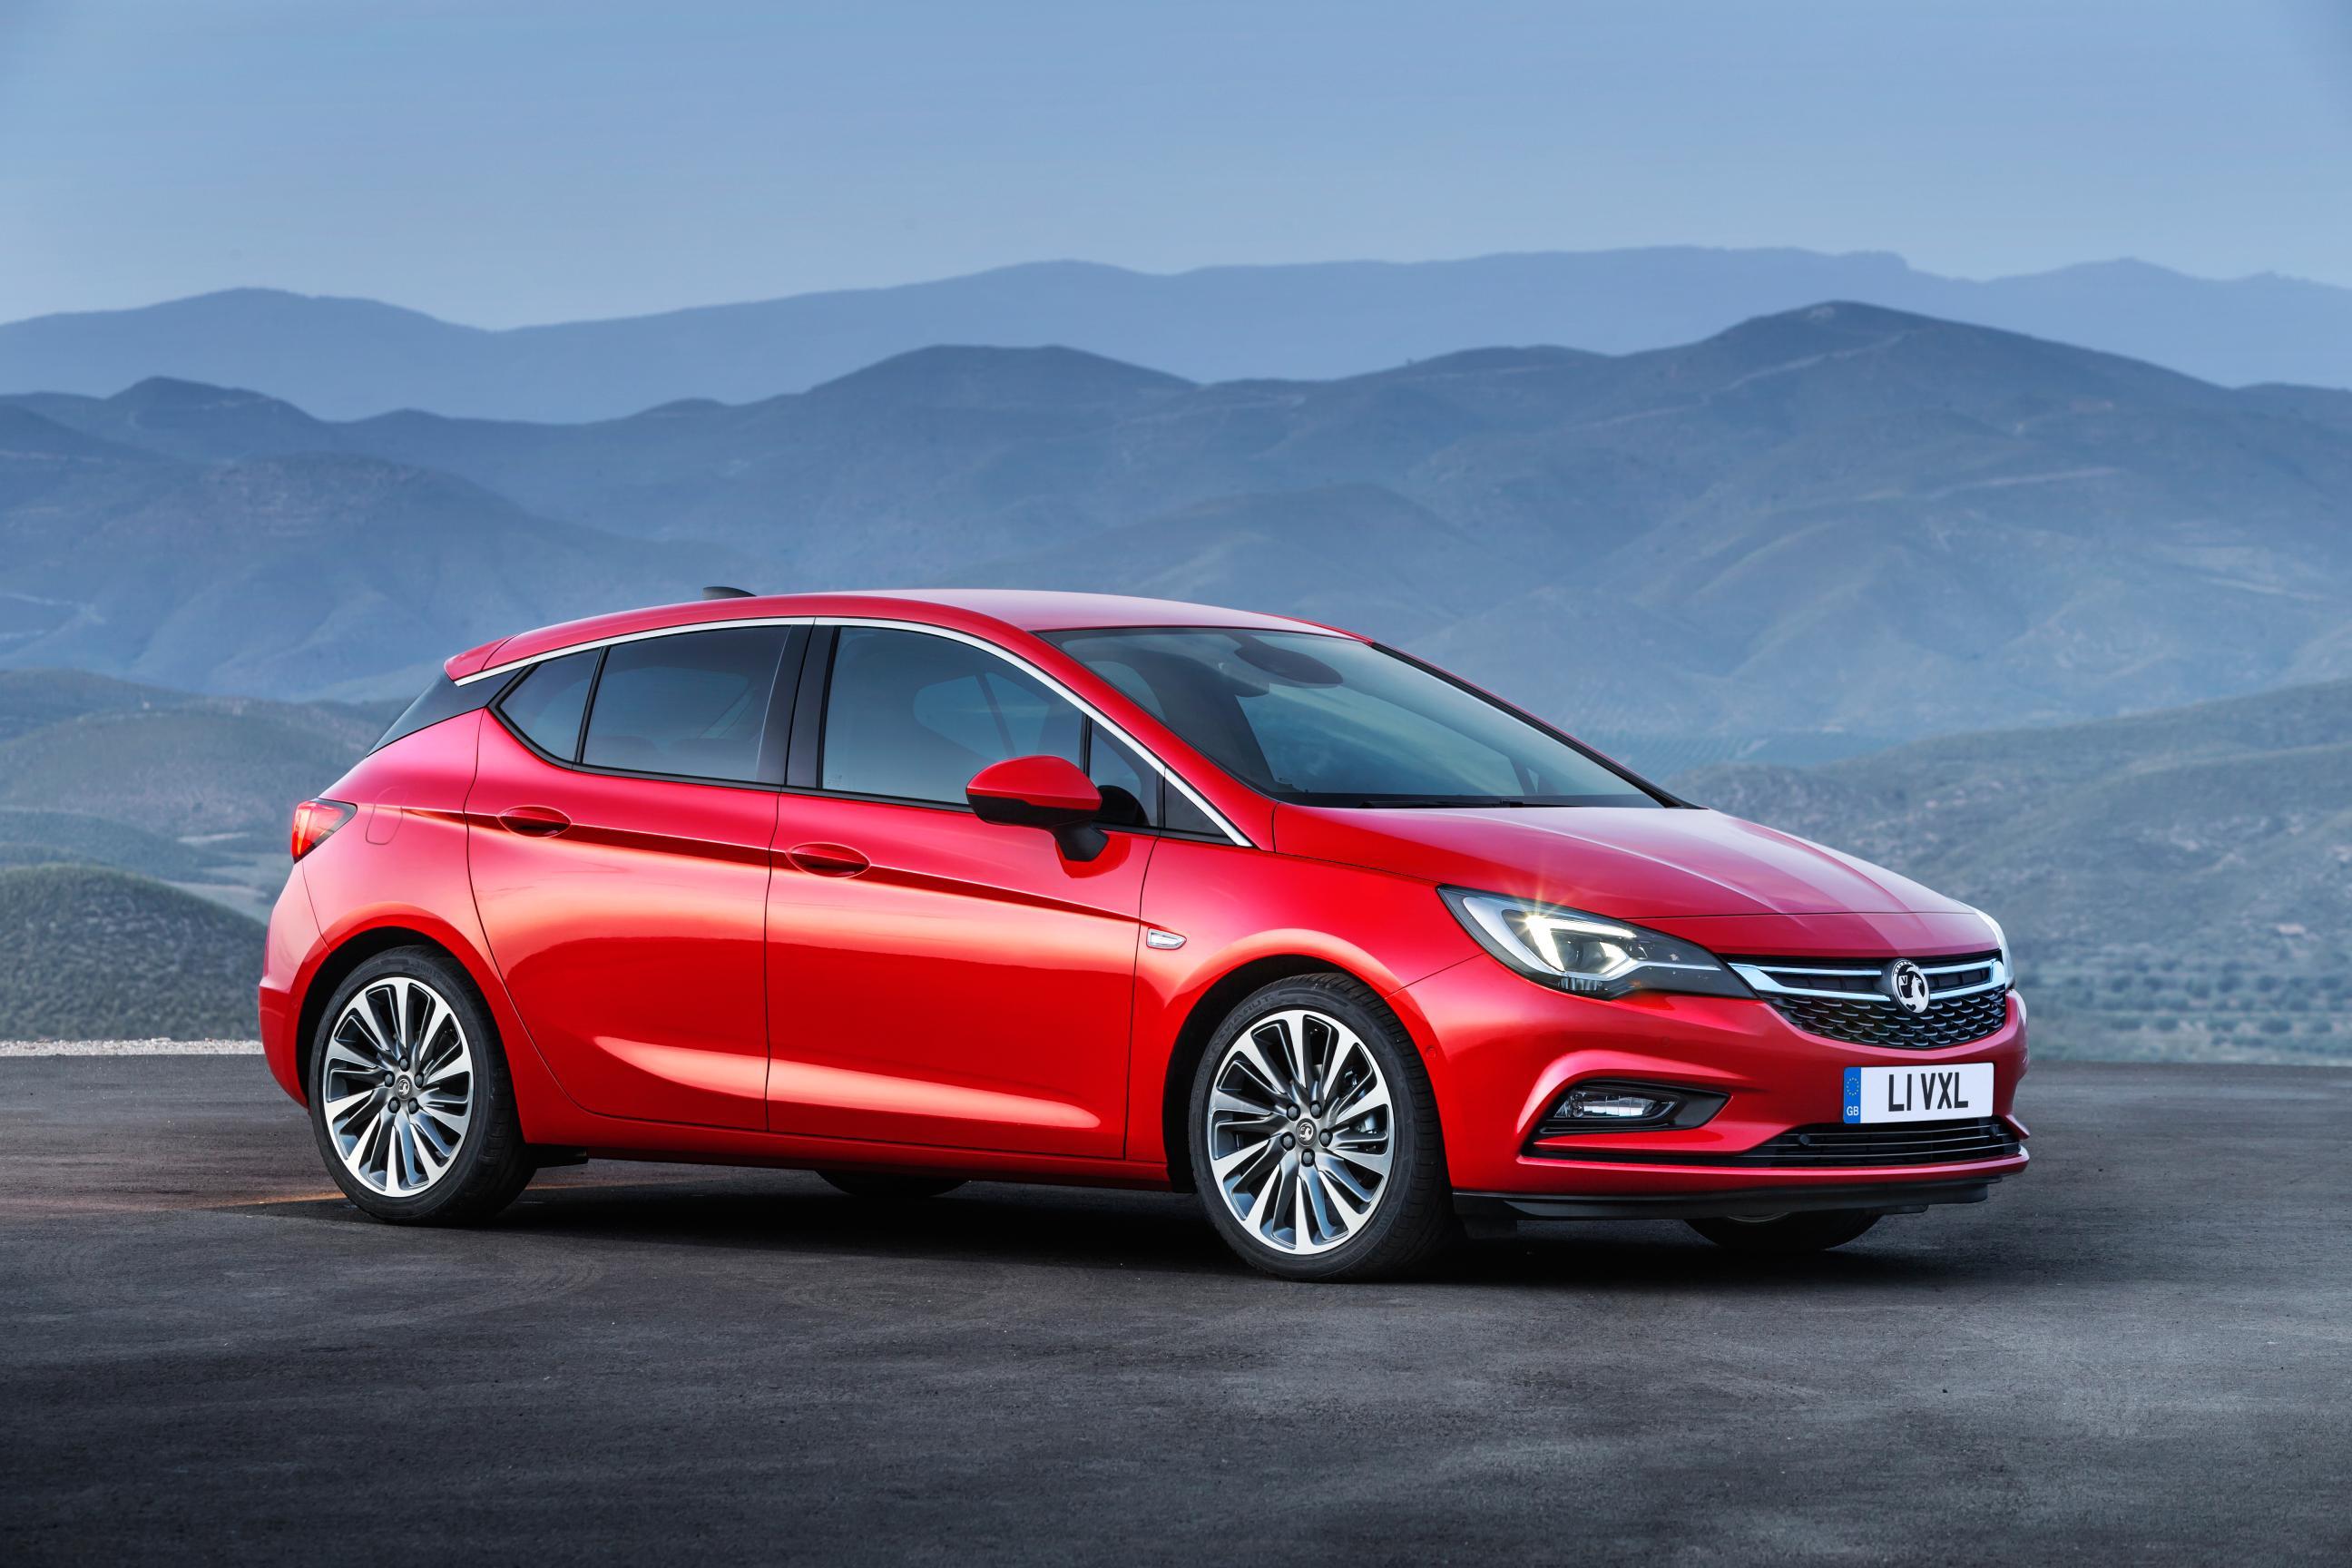 Vauxhall Astra Elite Nav 1 6 CDTI 160PS BiTurbo Review